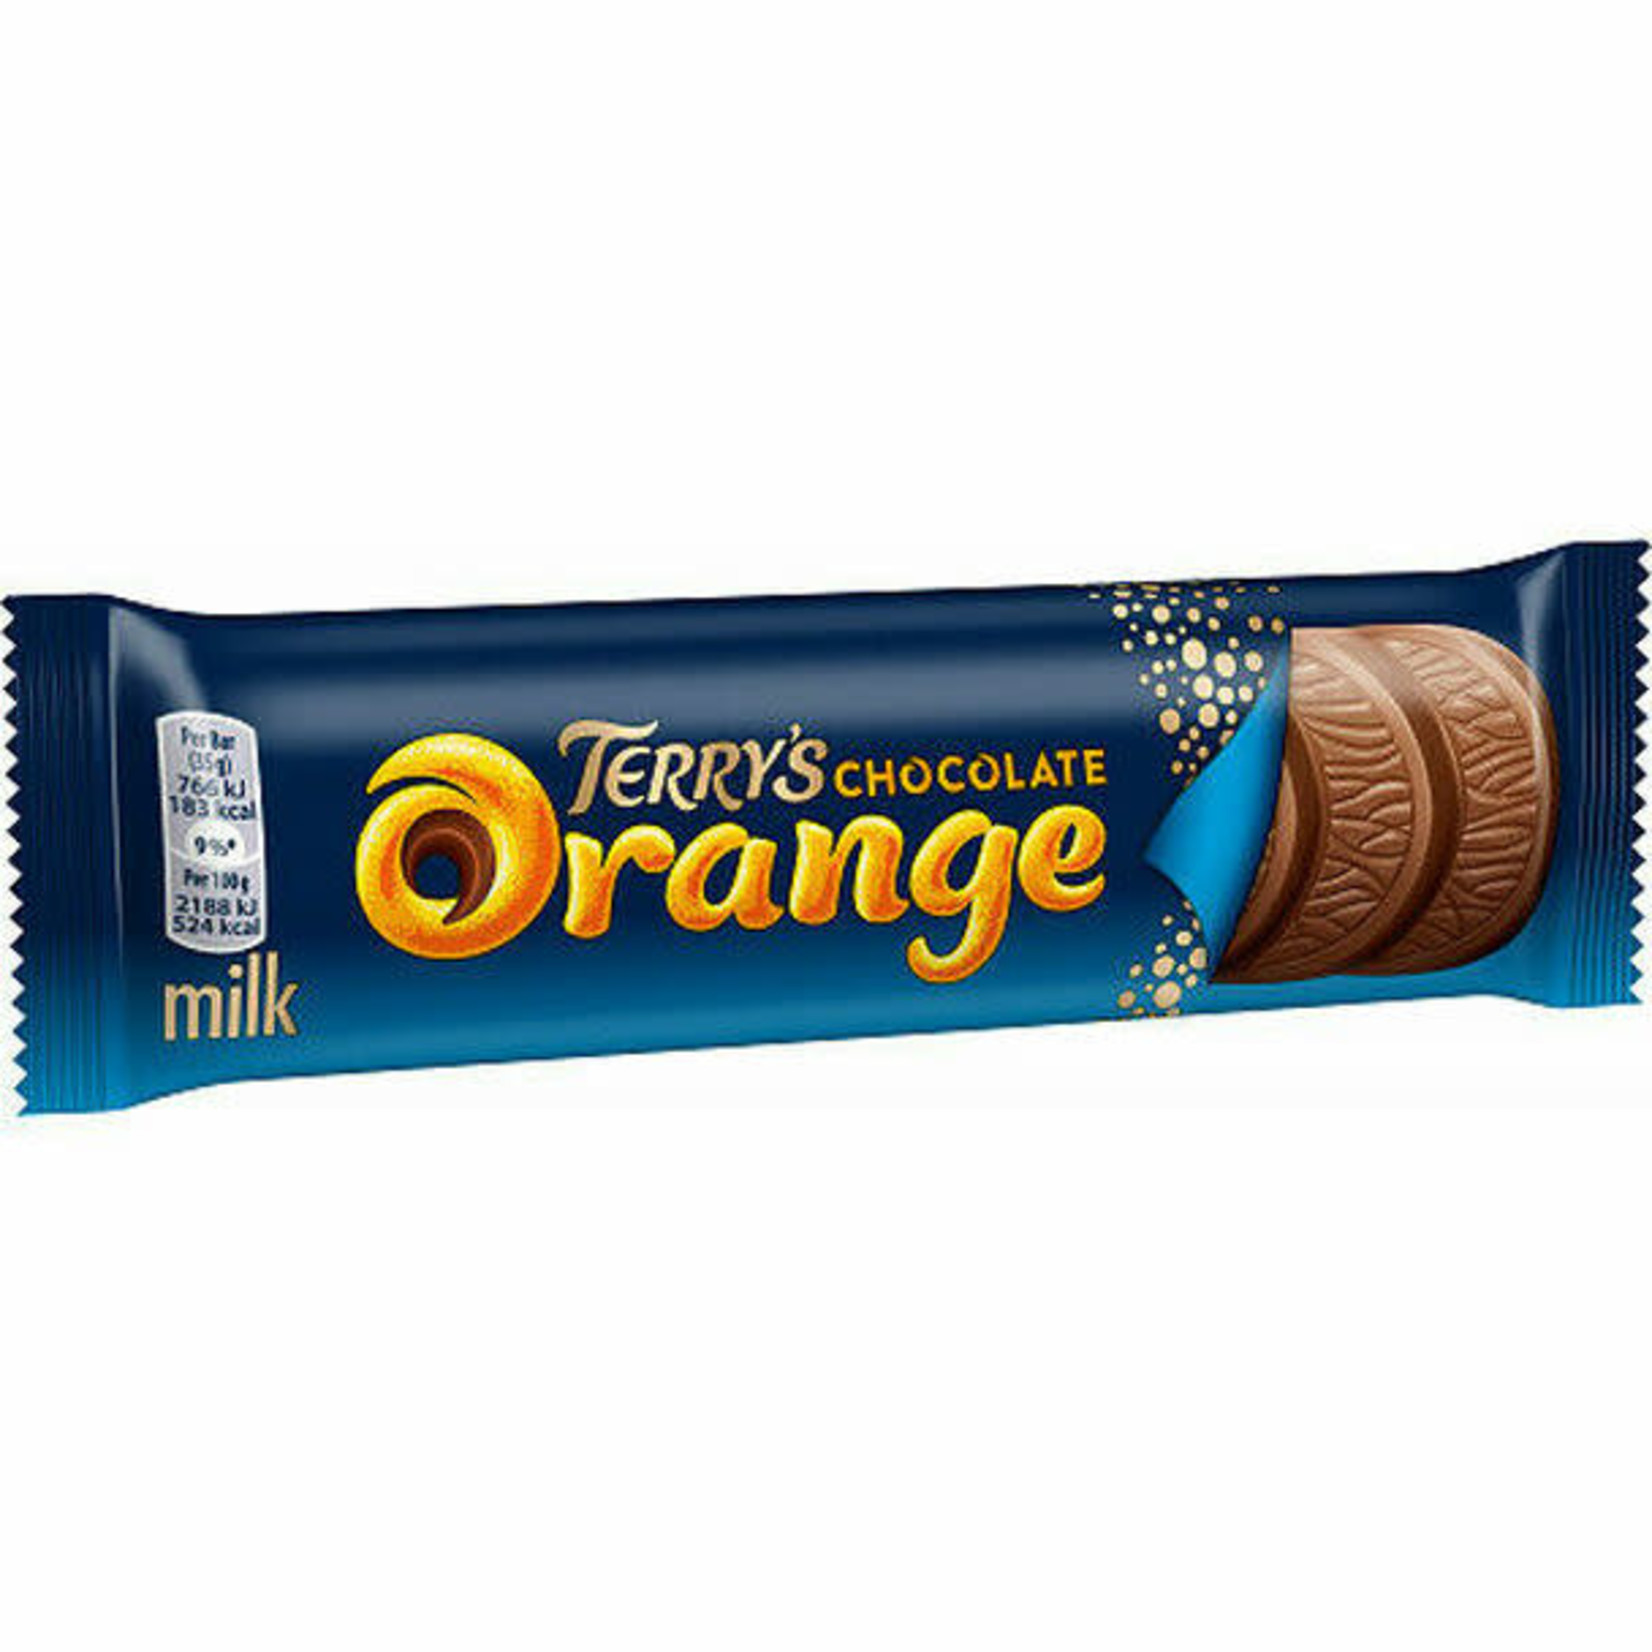 Terry's Chocolate Orange Bar, 35g